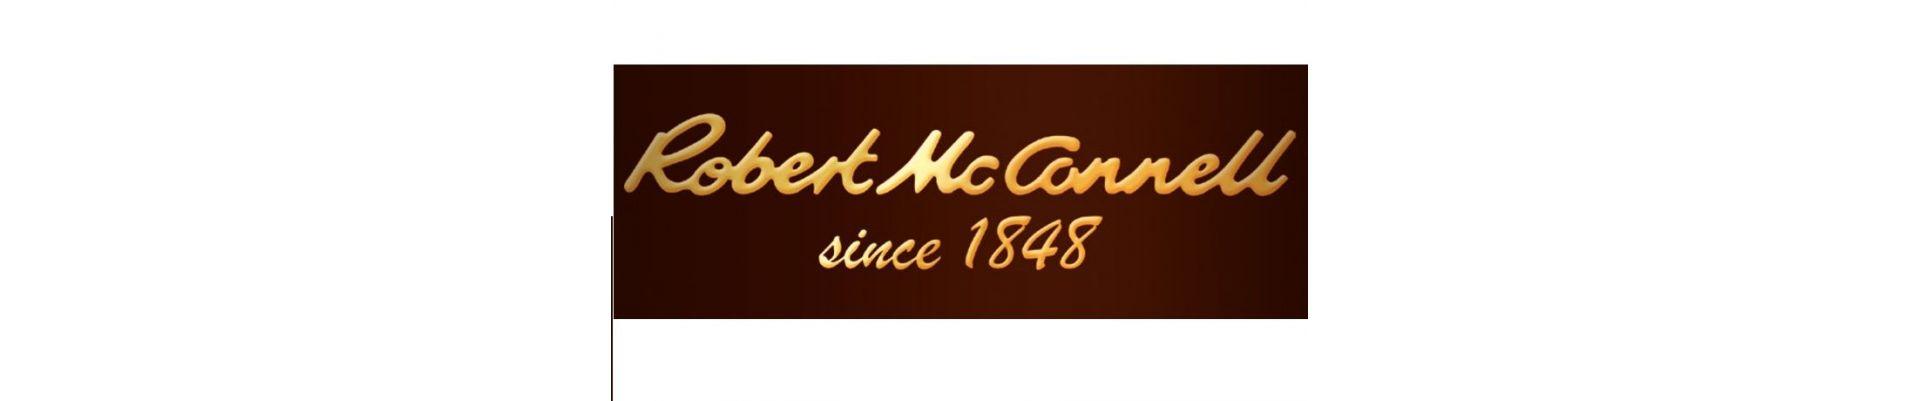 Tutun pipa Robert McConnell cumpar tutun de pipe Robert McConnell pret